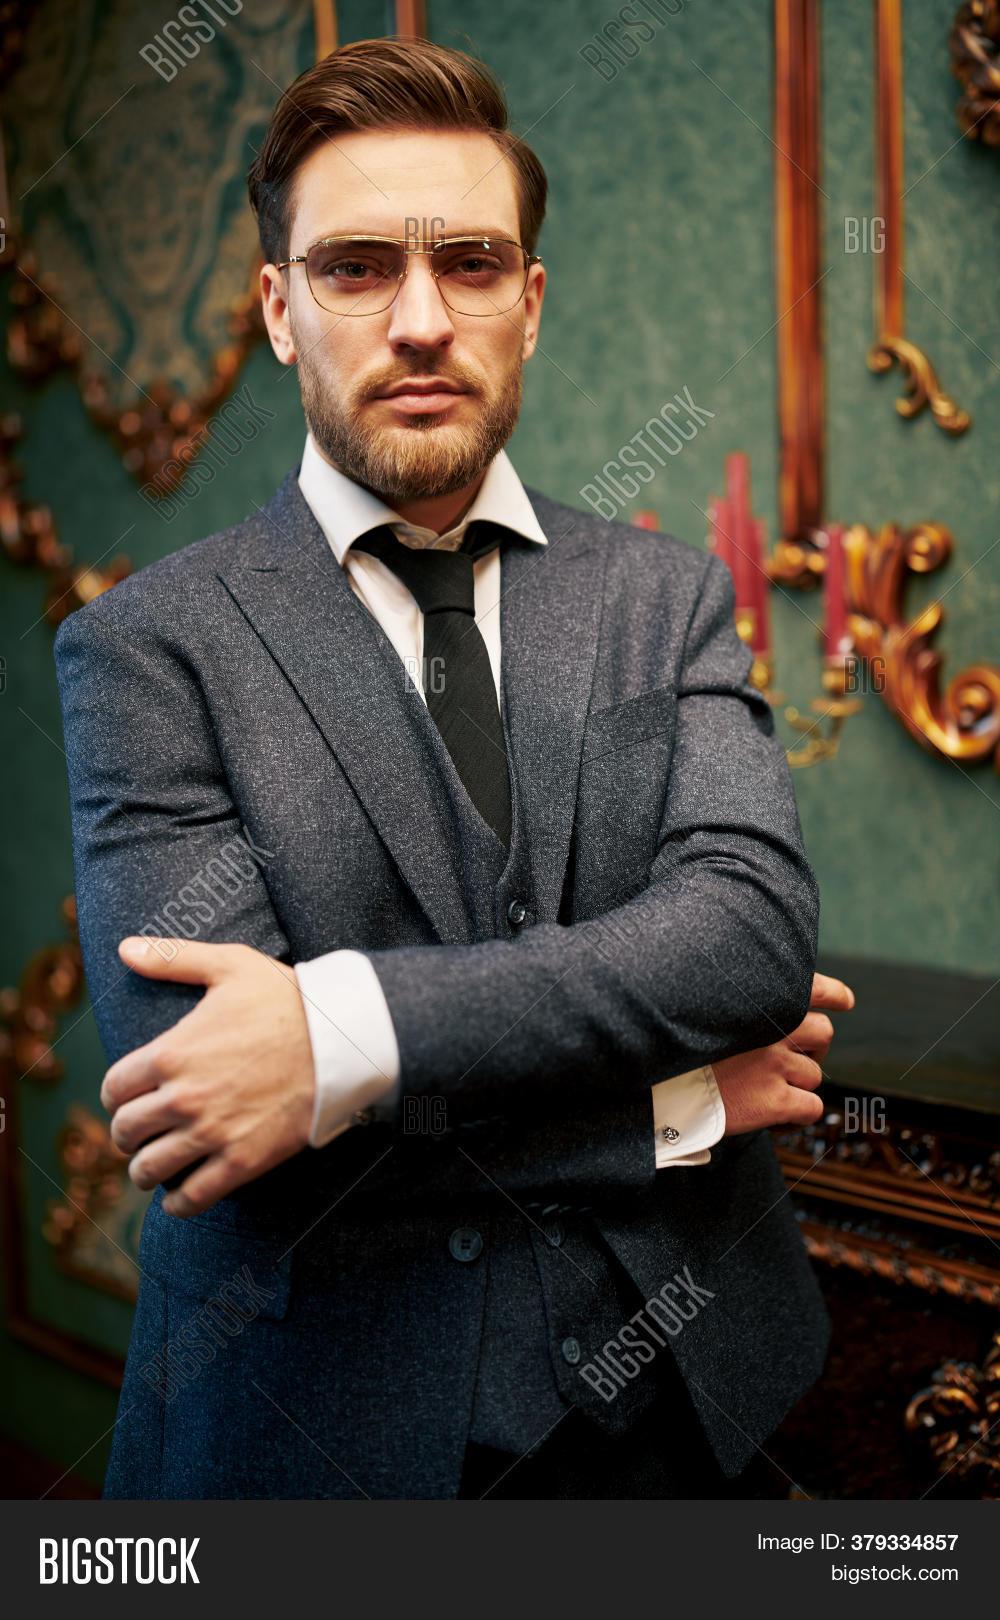 Handsome Rich Man Image & Photo (Free Trial) | Bigstock